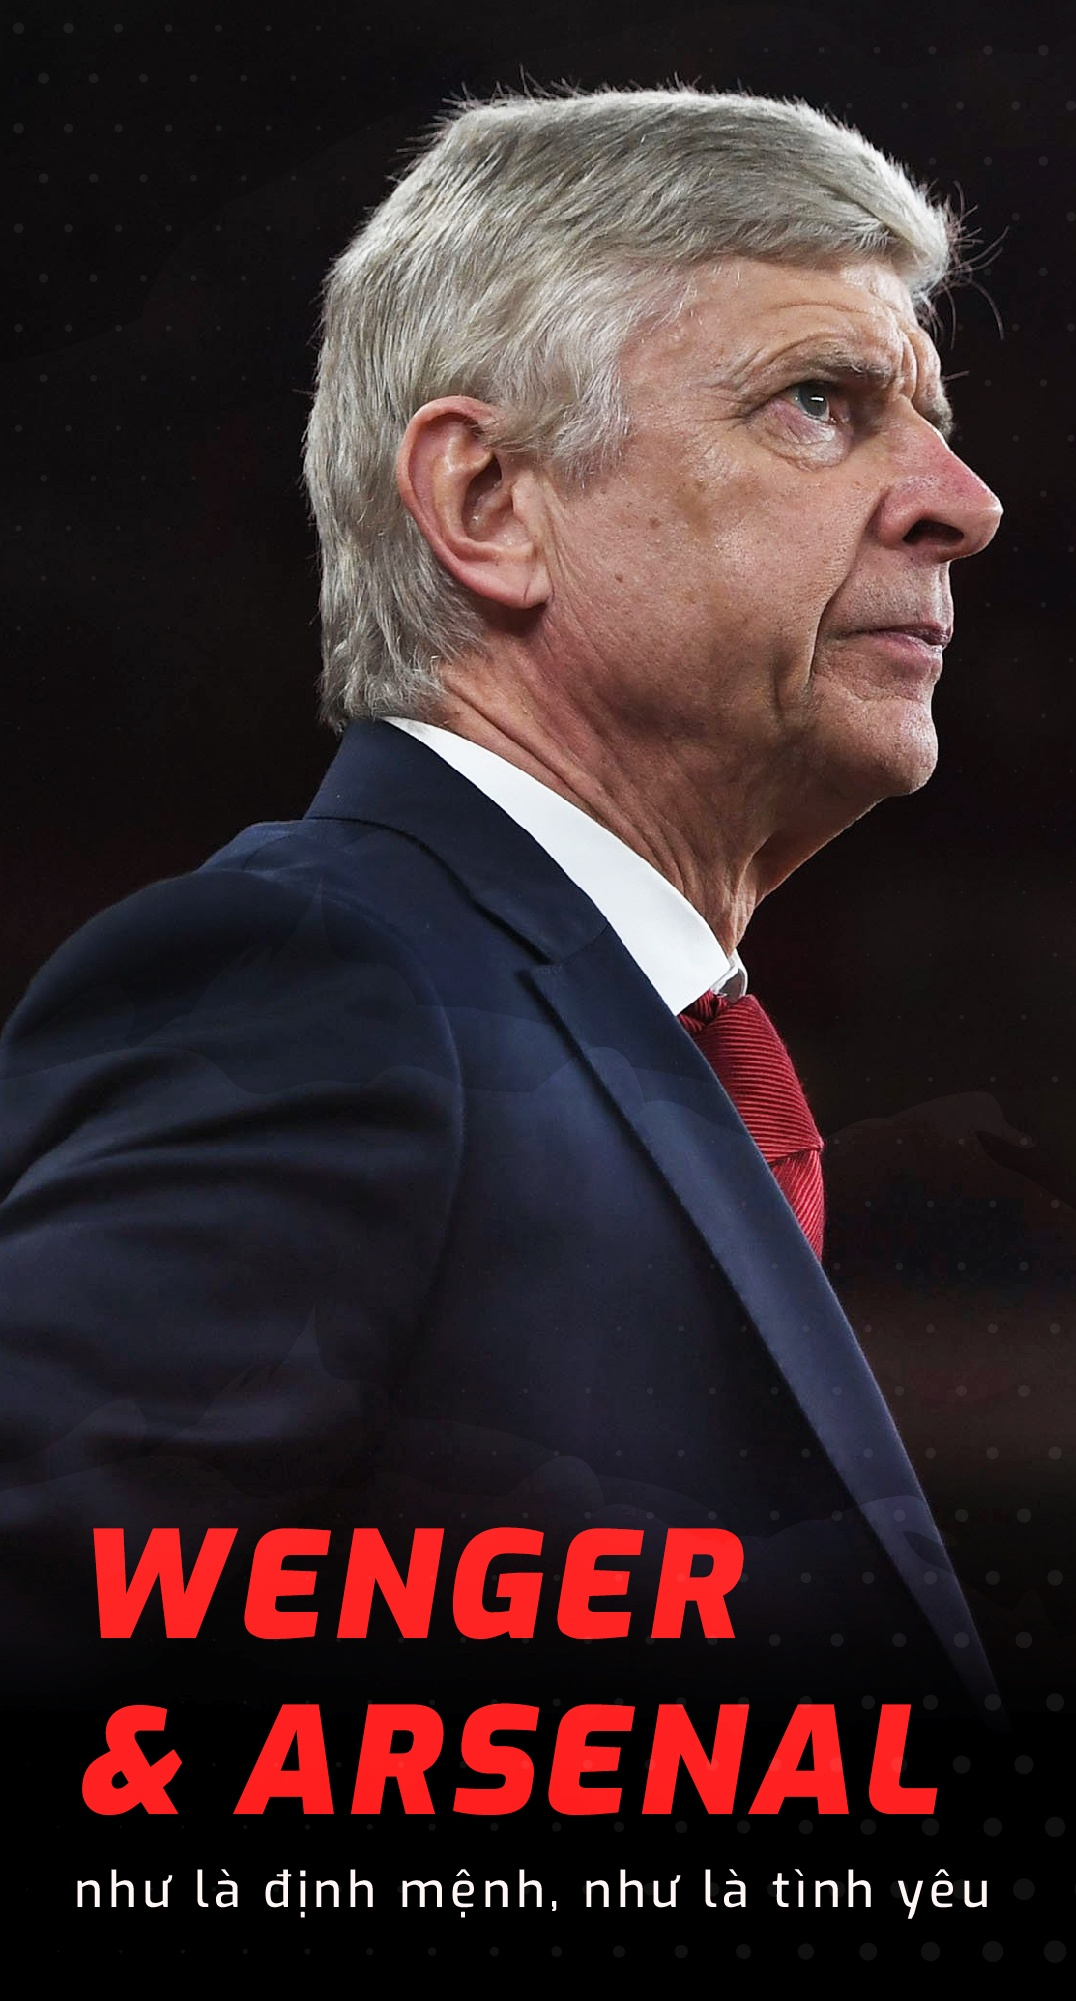 Wenger va Arsenal: Den vi dinh menh, gan bo vi tinh yeu hinh anh 1